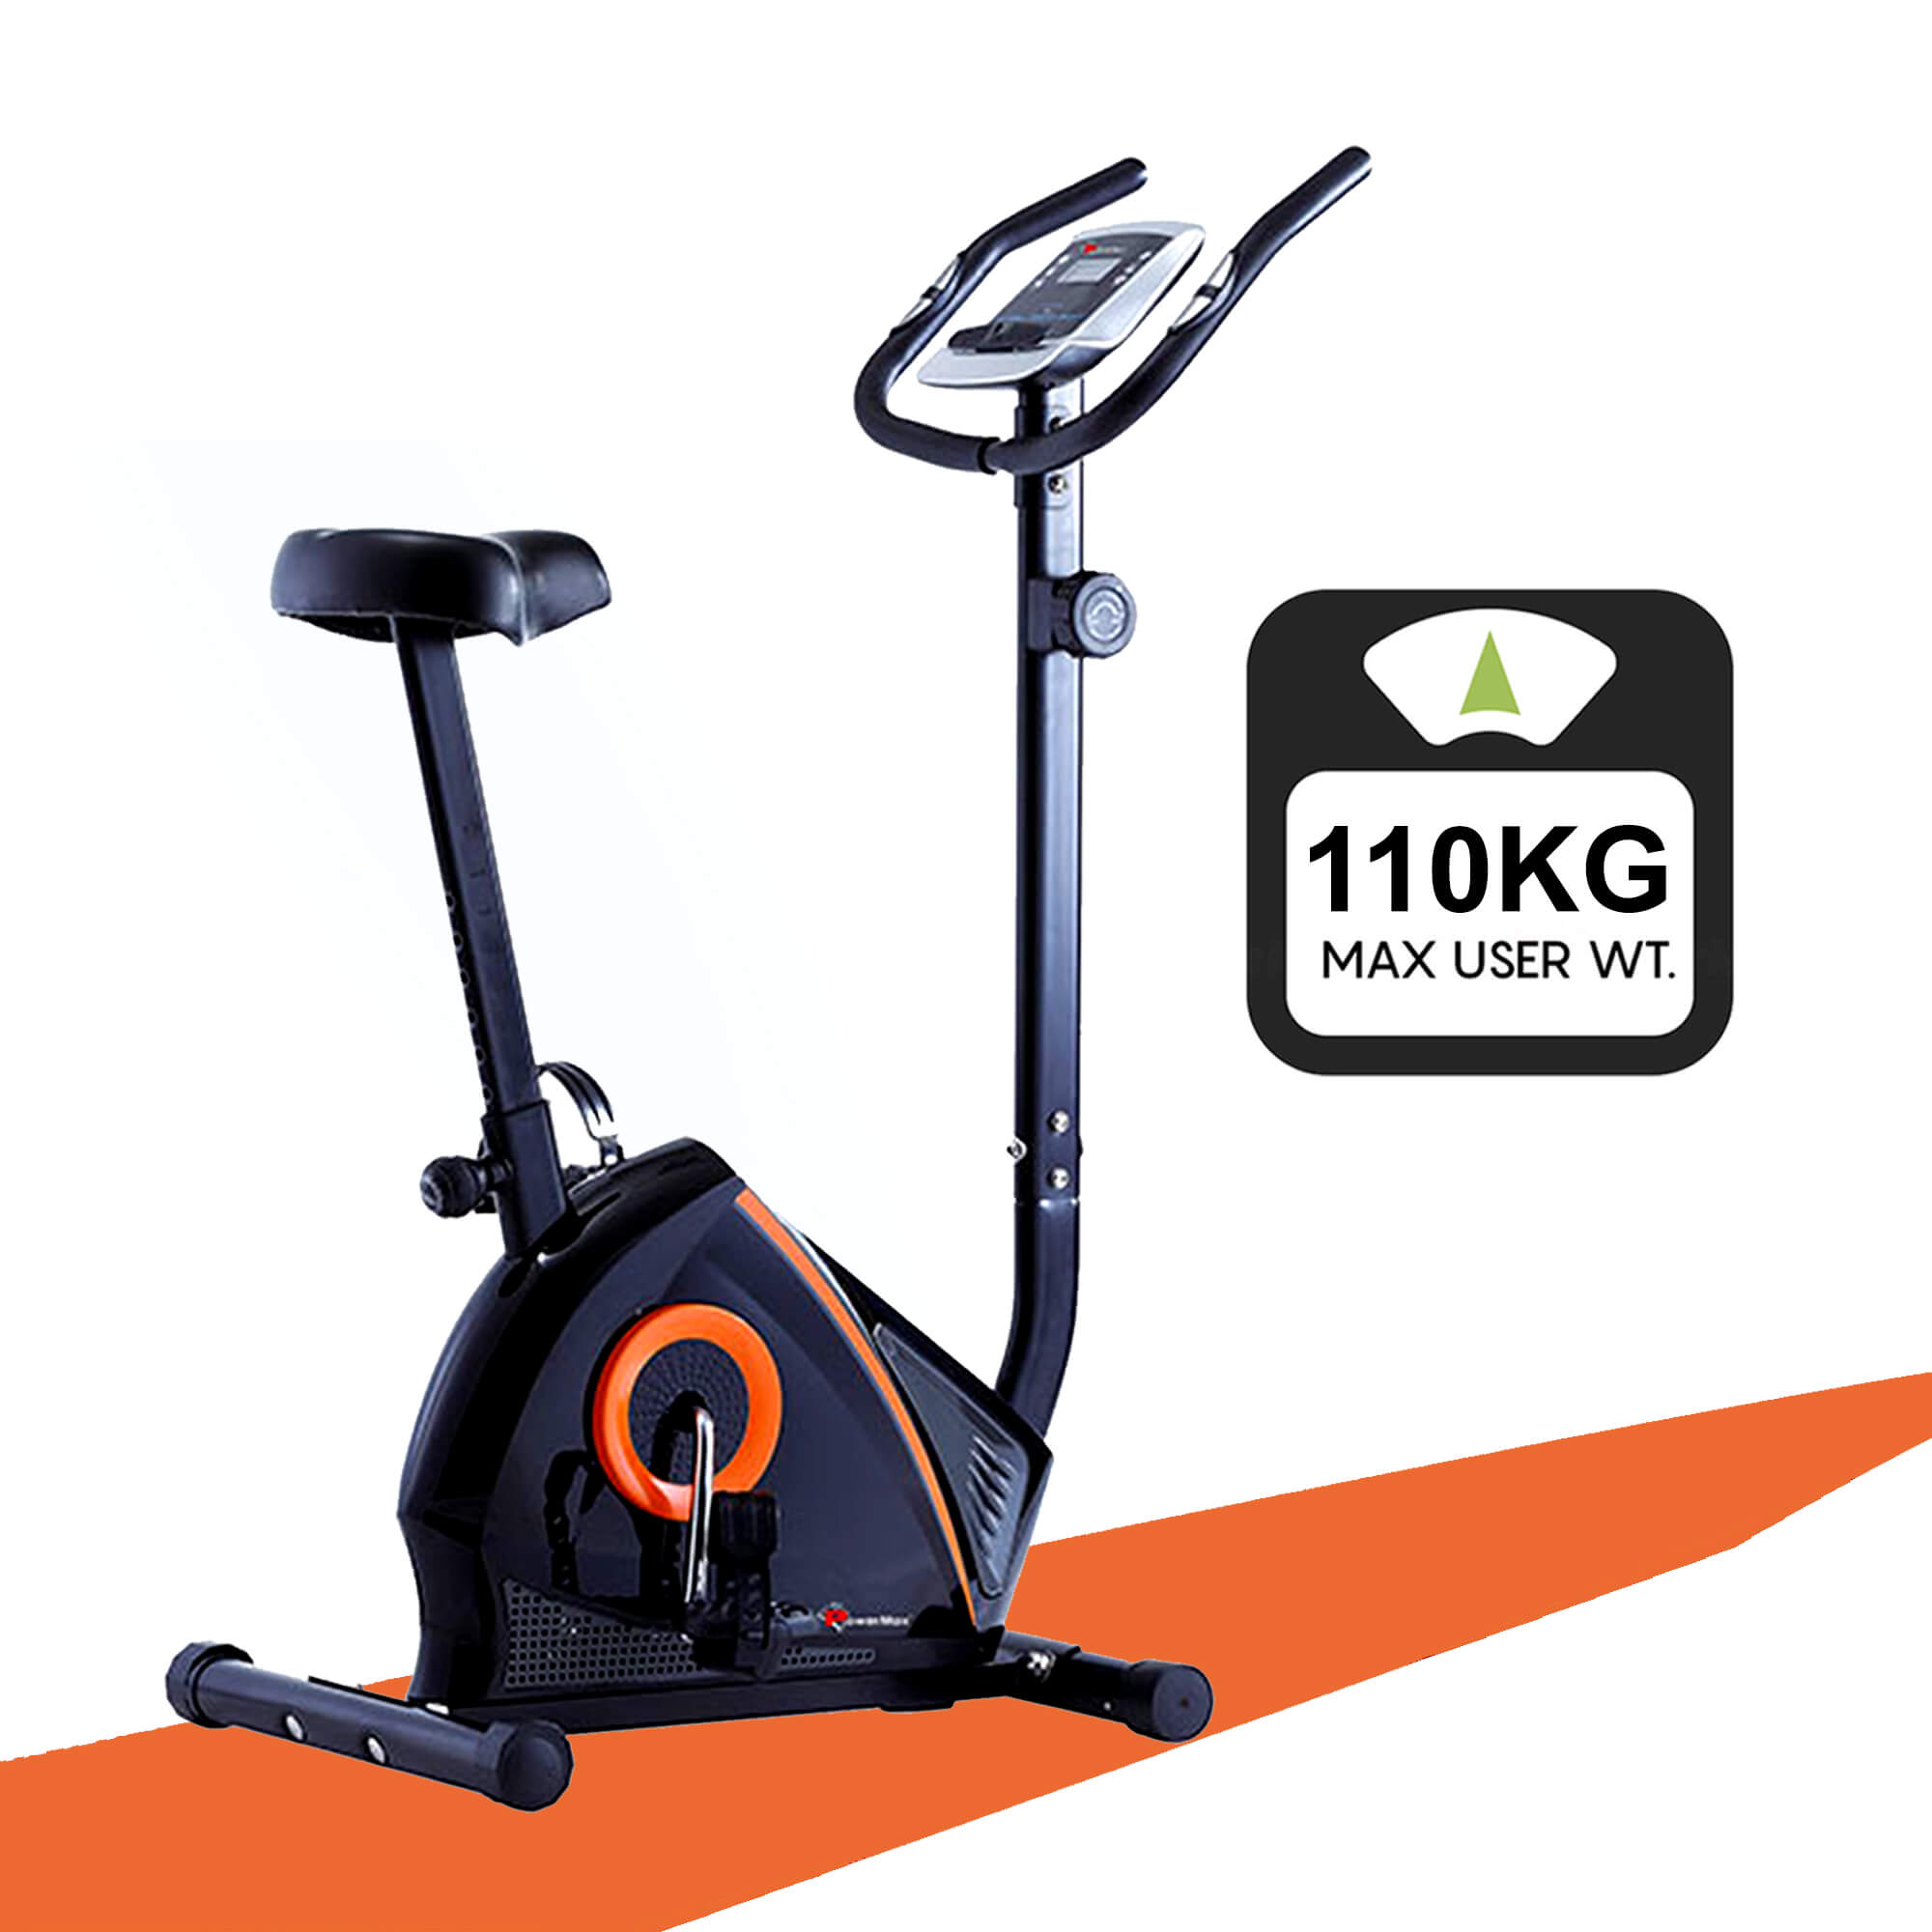 BU-500 Magnetic Upright Bike